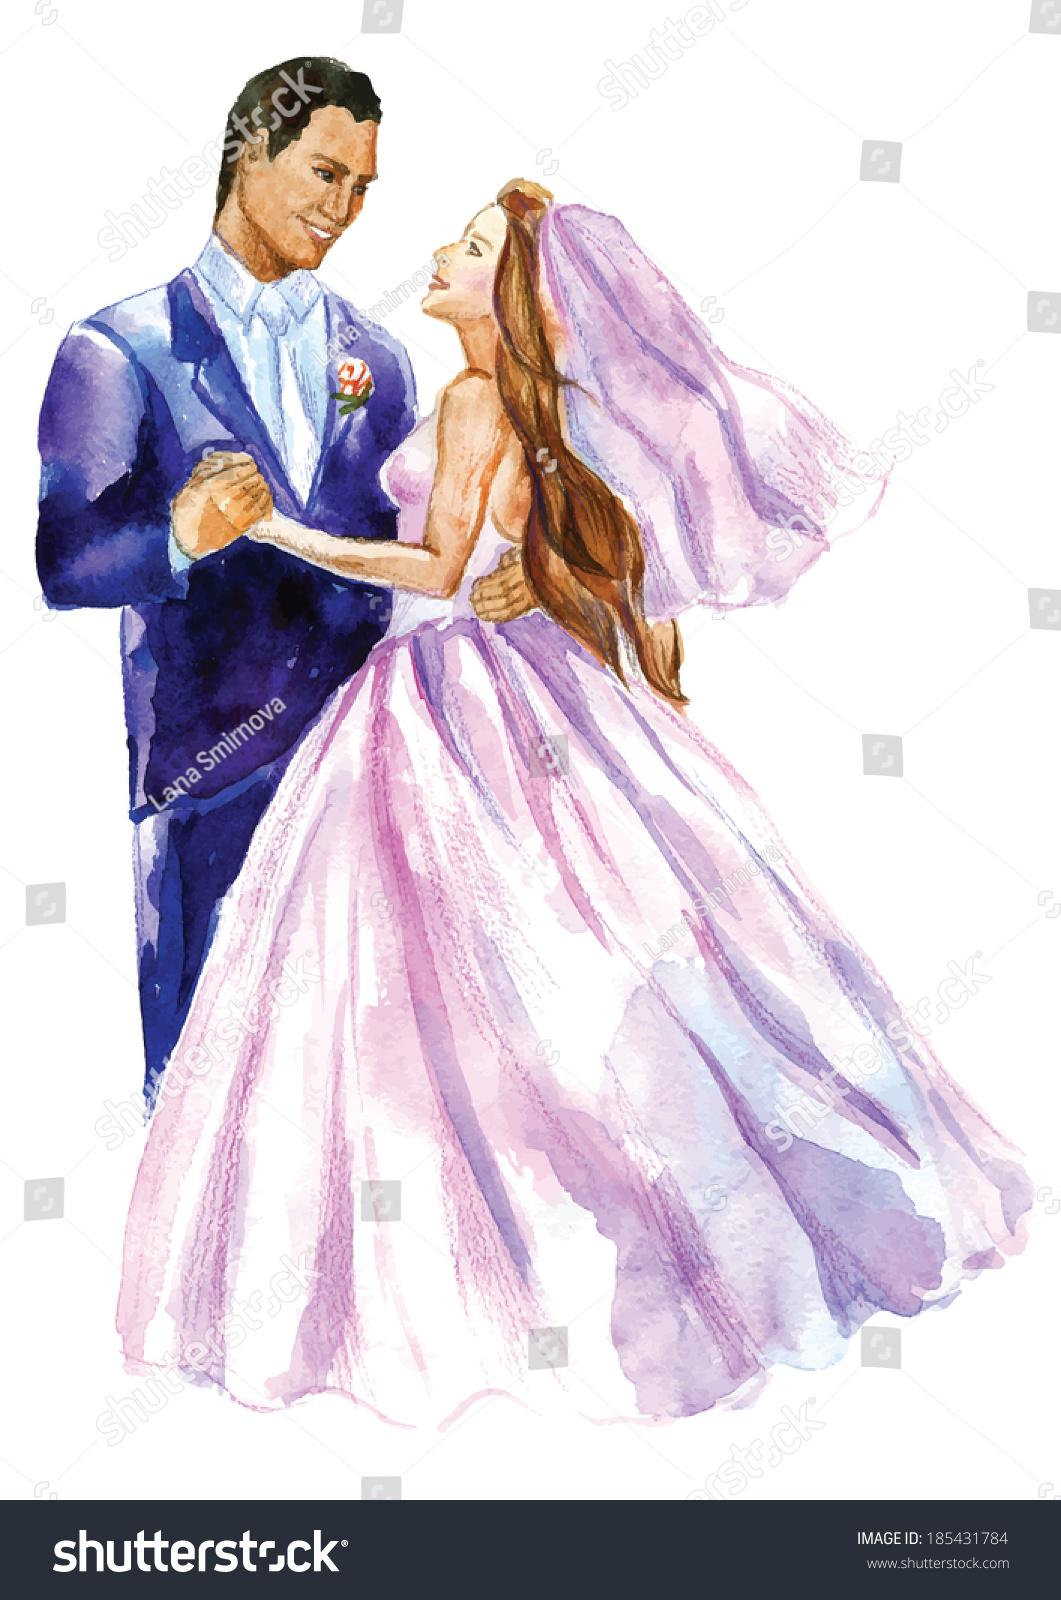 Essay on hobby of dance wedding